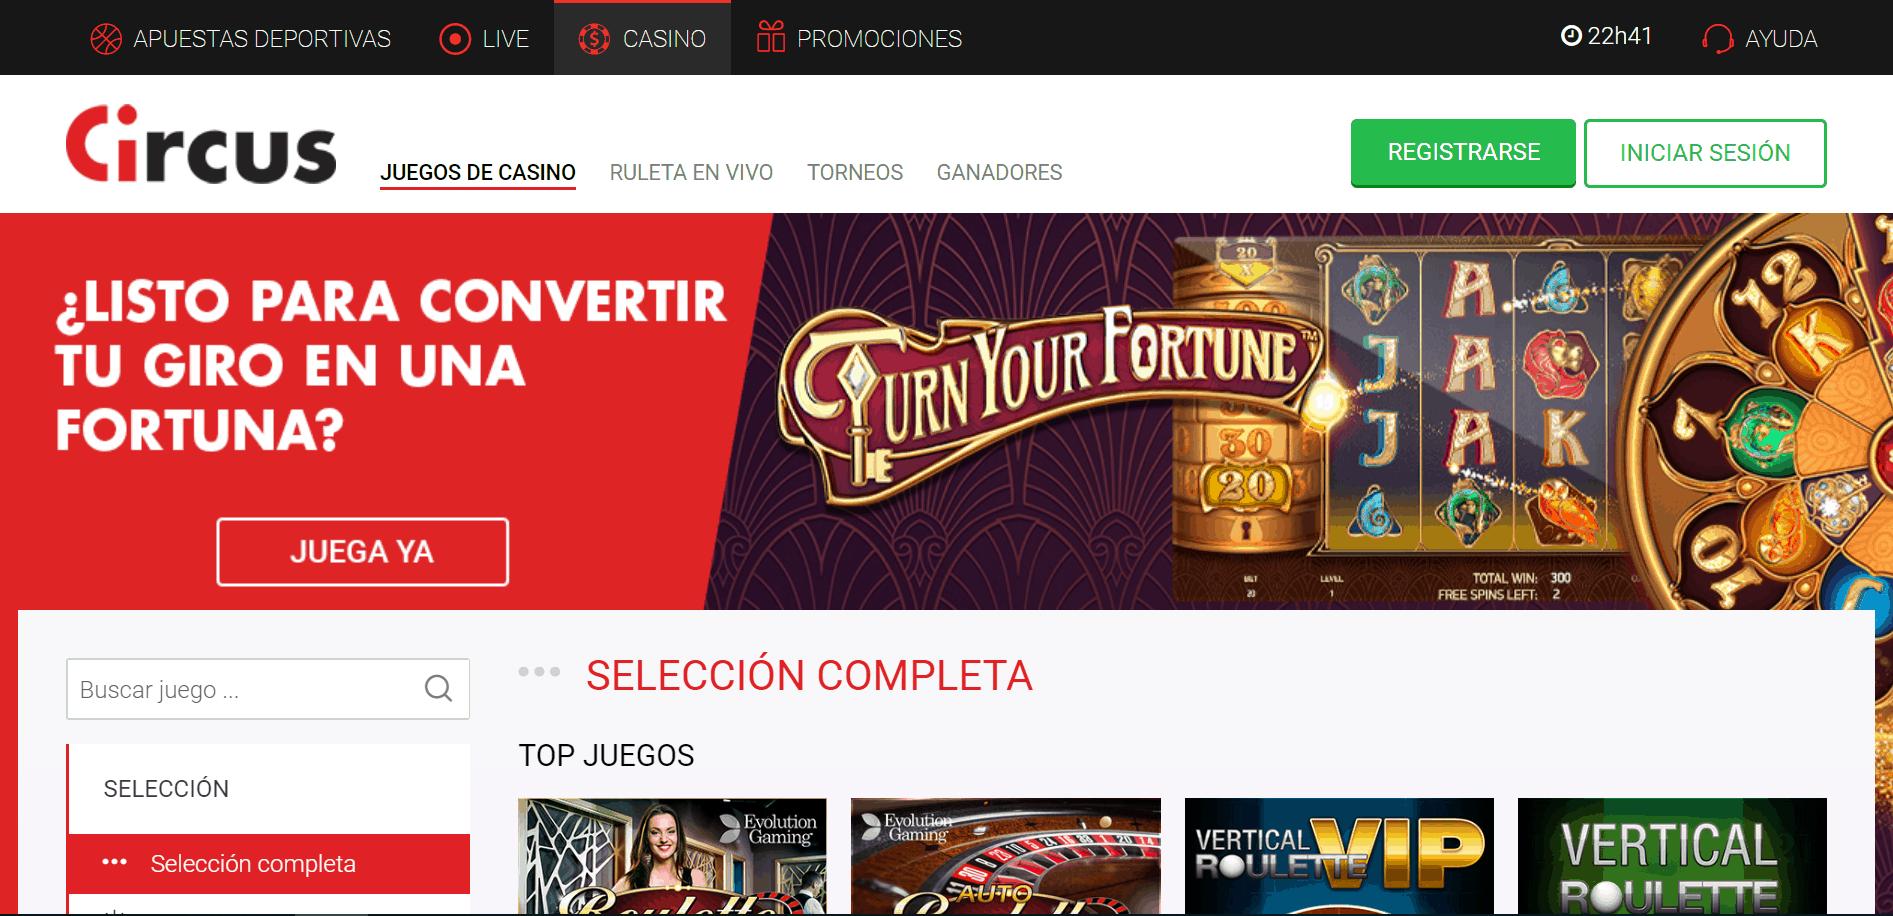 Circus.es desktop